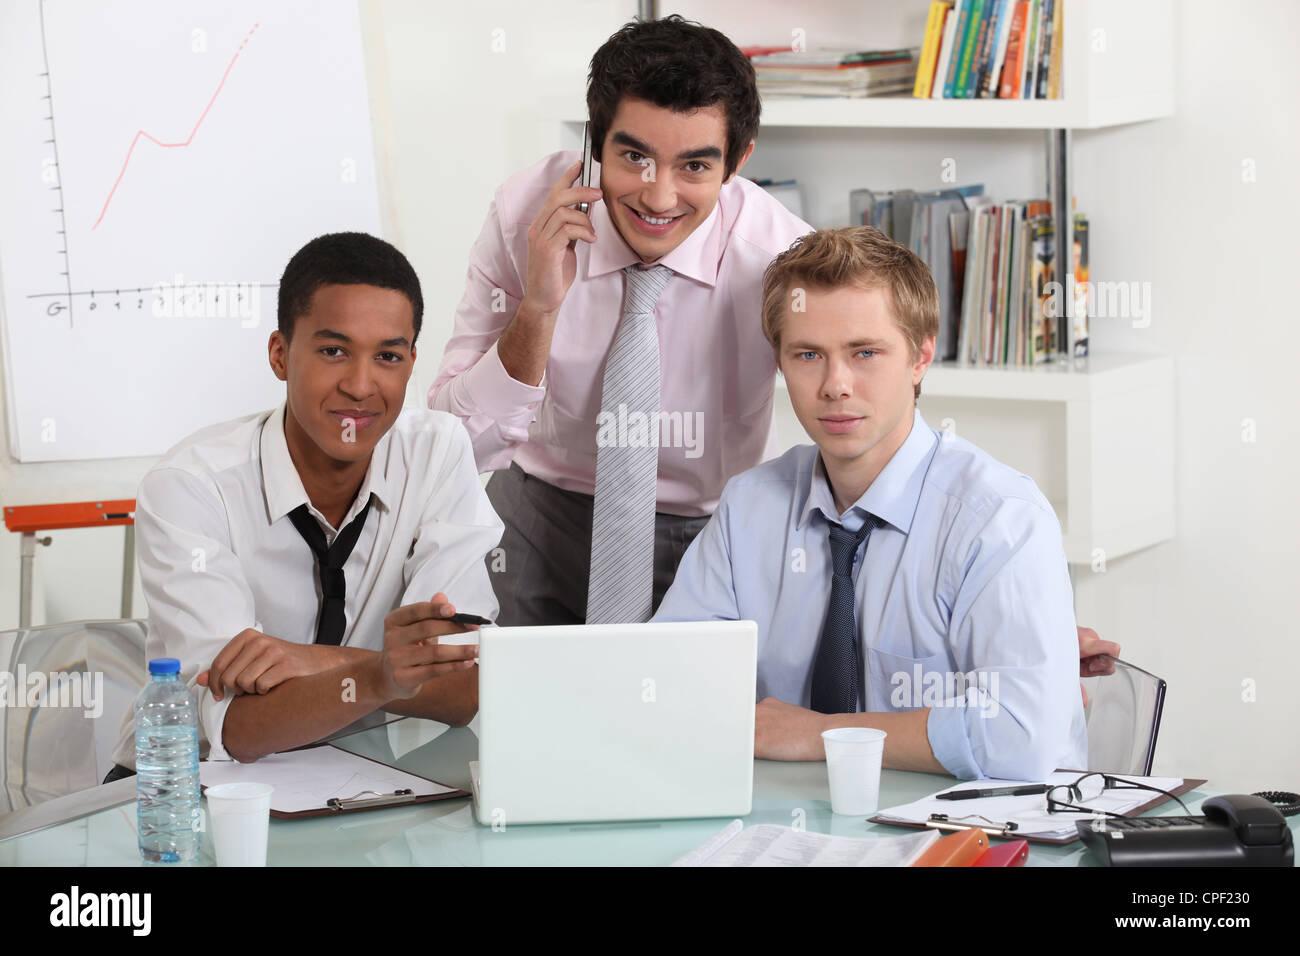 Adult education - Stock Image